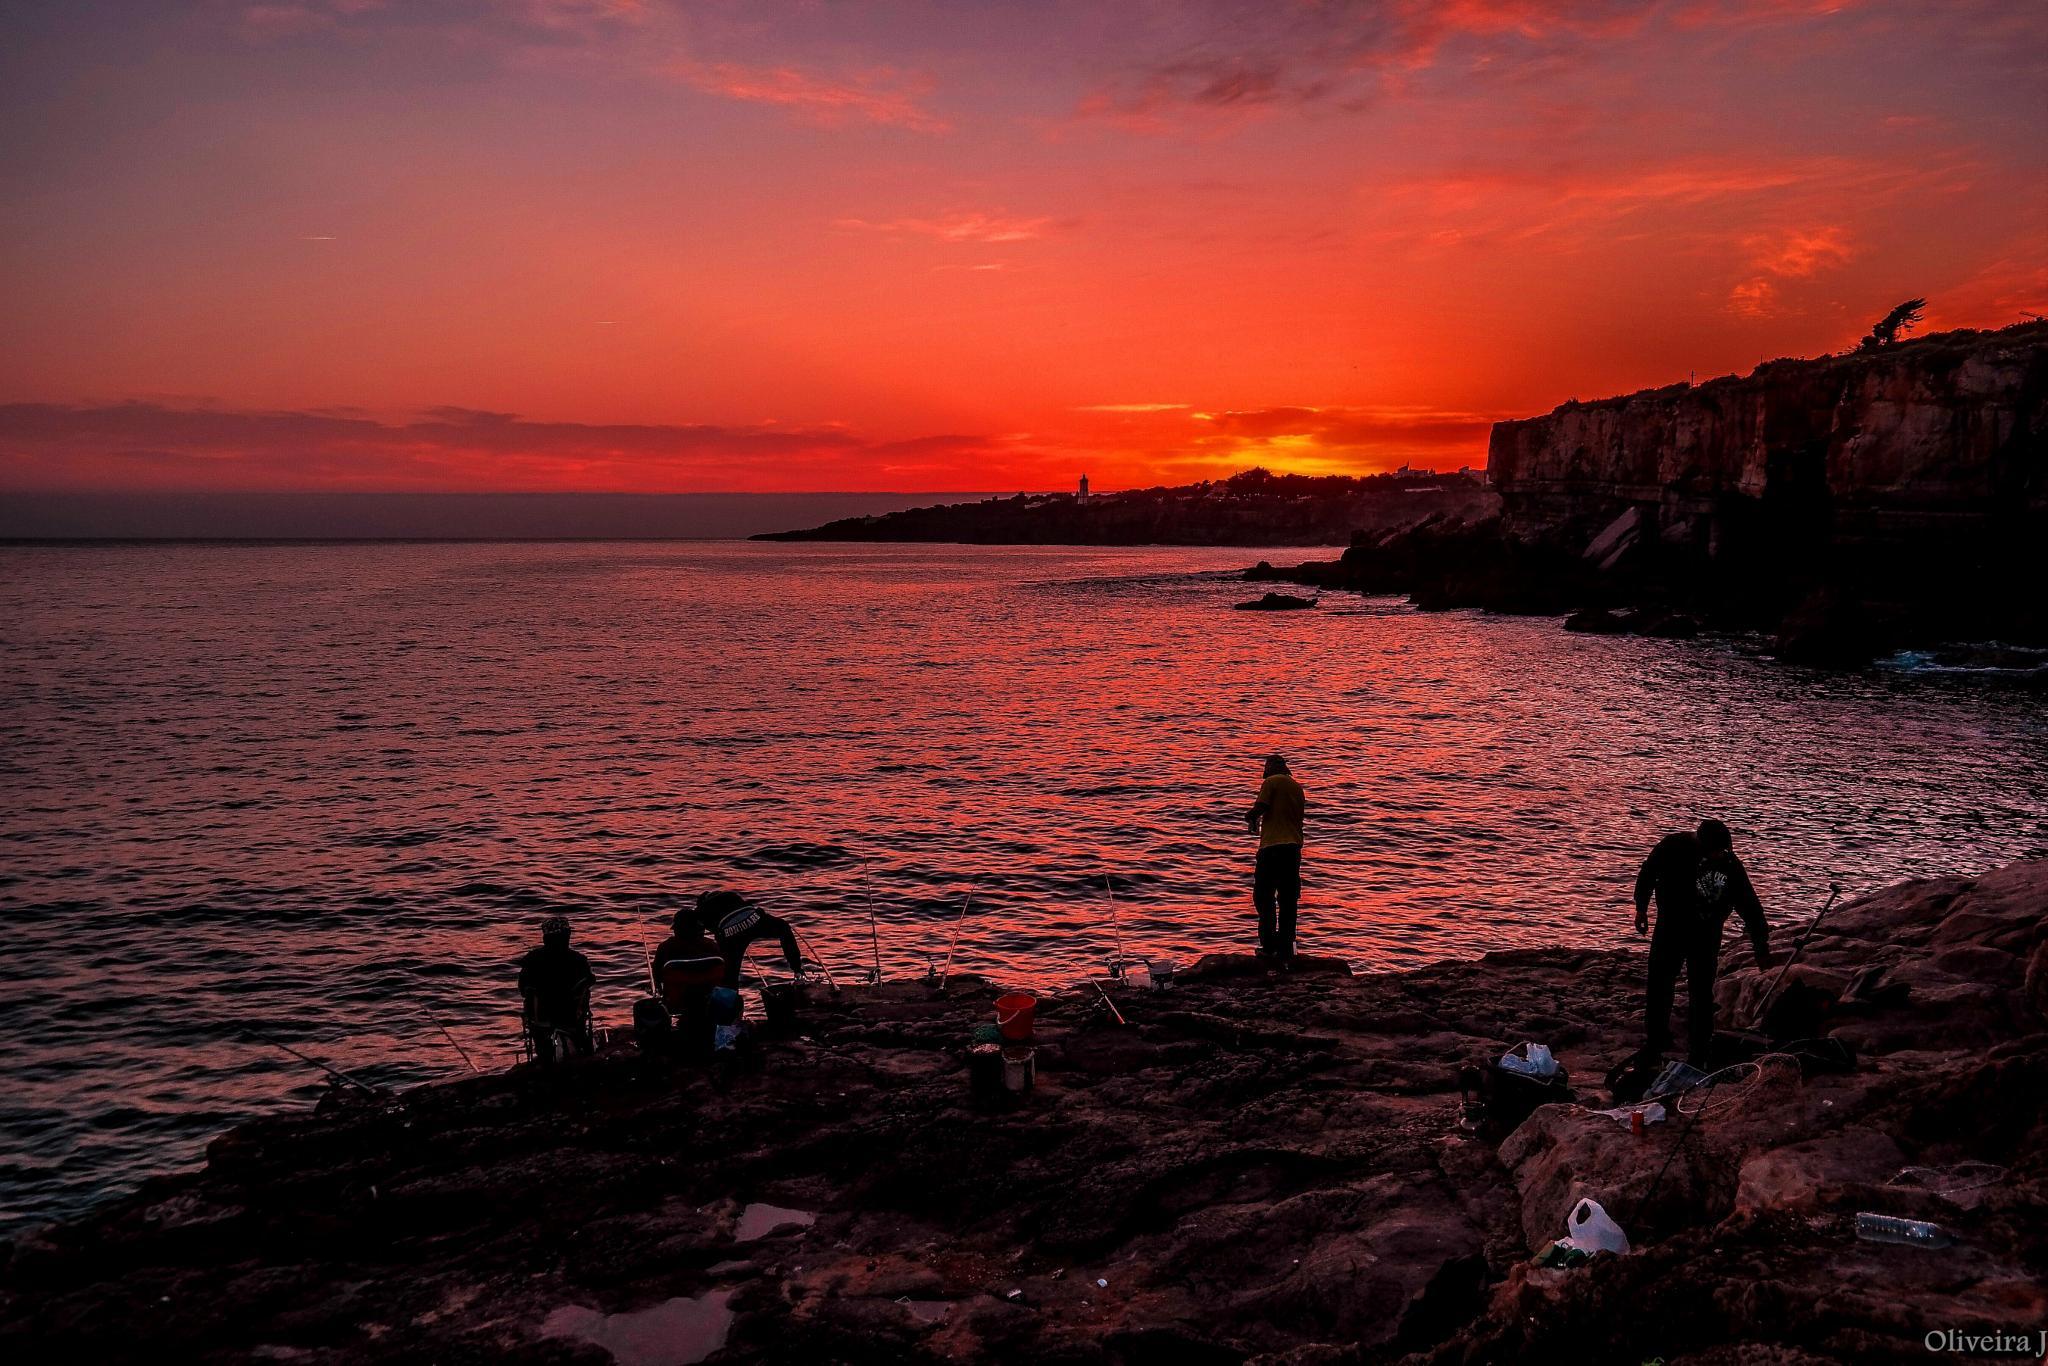 FISHERMEN AT SUNSET by joseoliveira1694